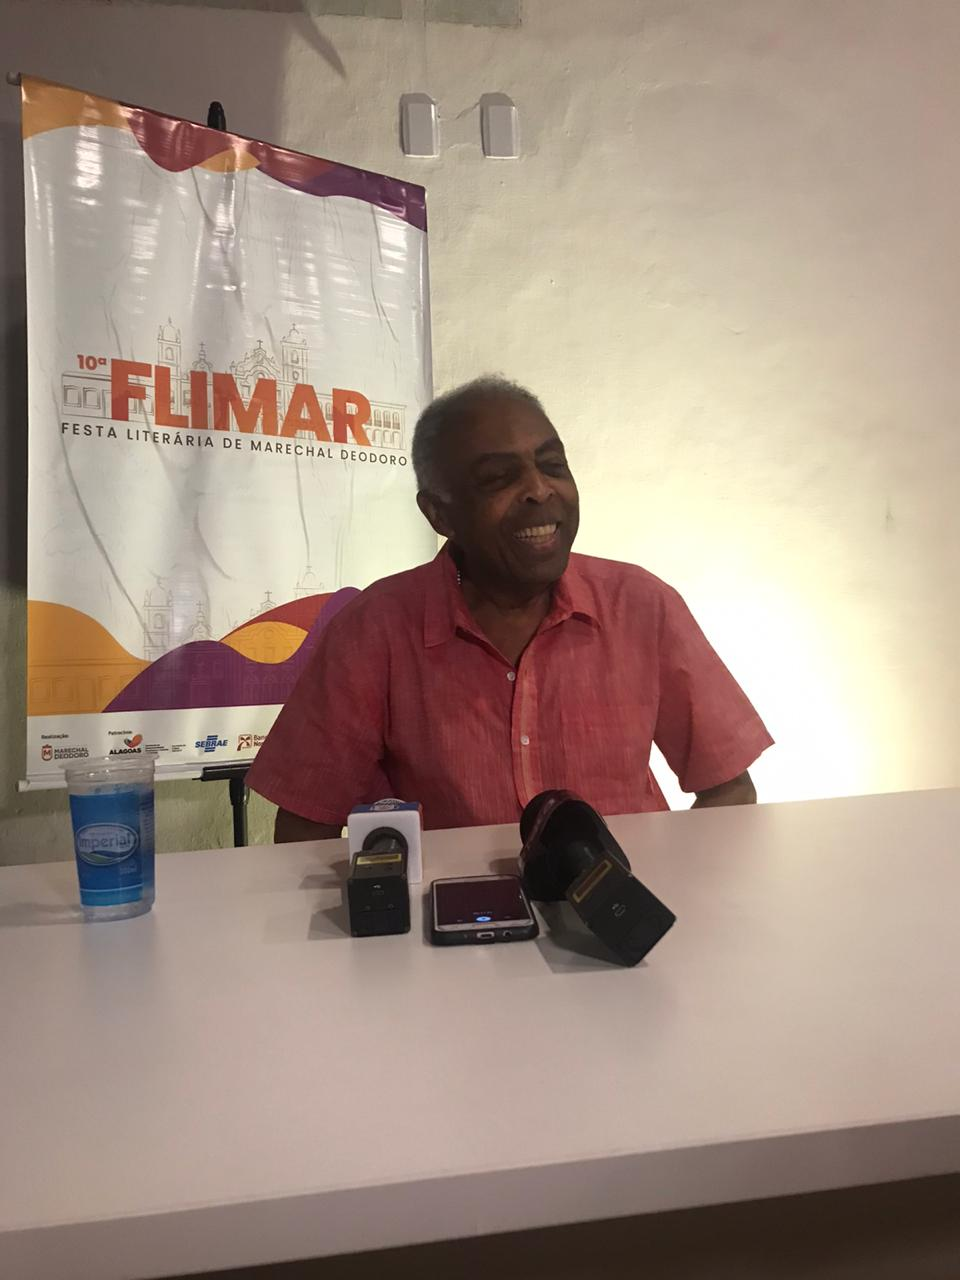 Cantor e compositor Gilberto Gil foi o homenageado da Flimar